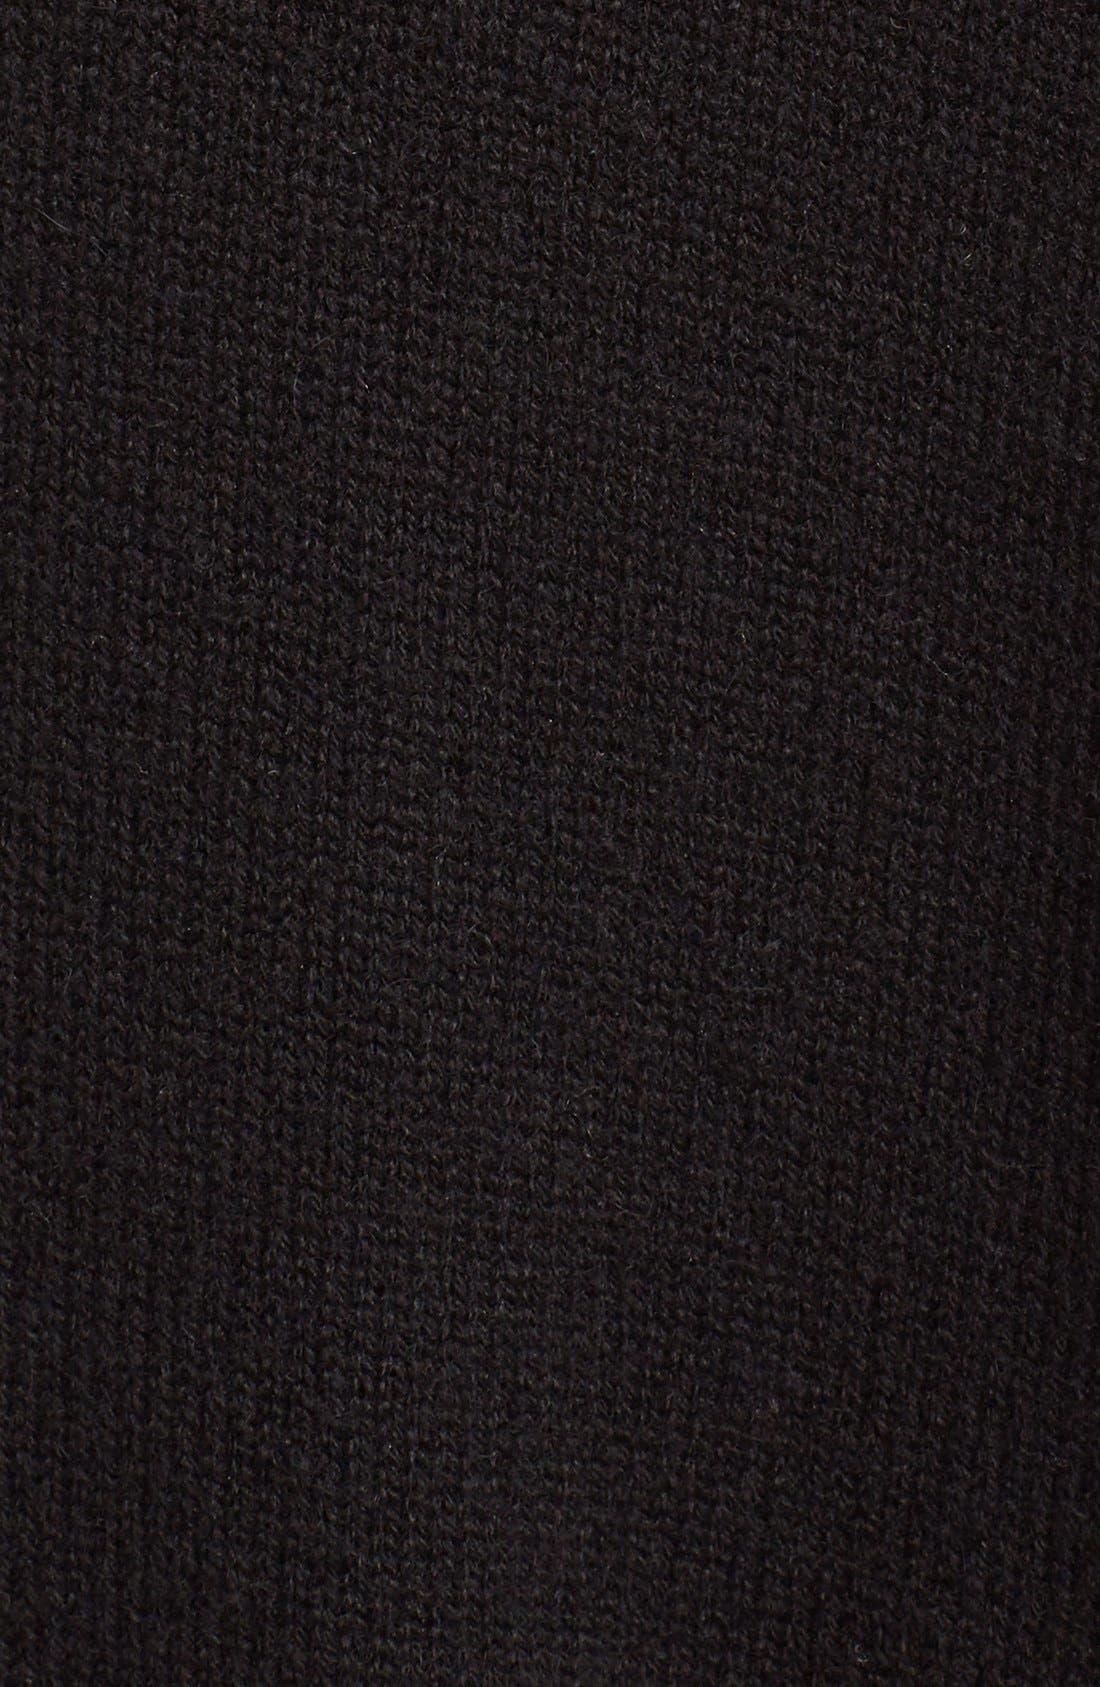 Alternate Image 3  - Dolce&Gabbana Turtleneck Cashmere Sweater